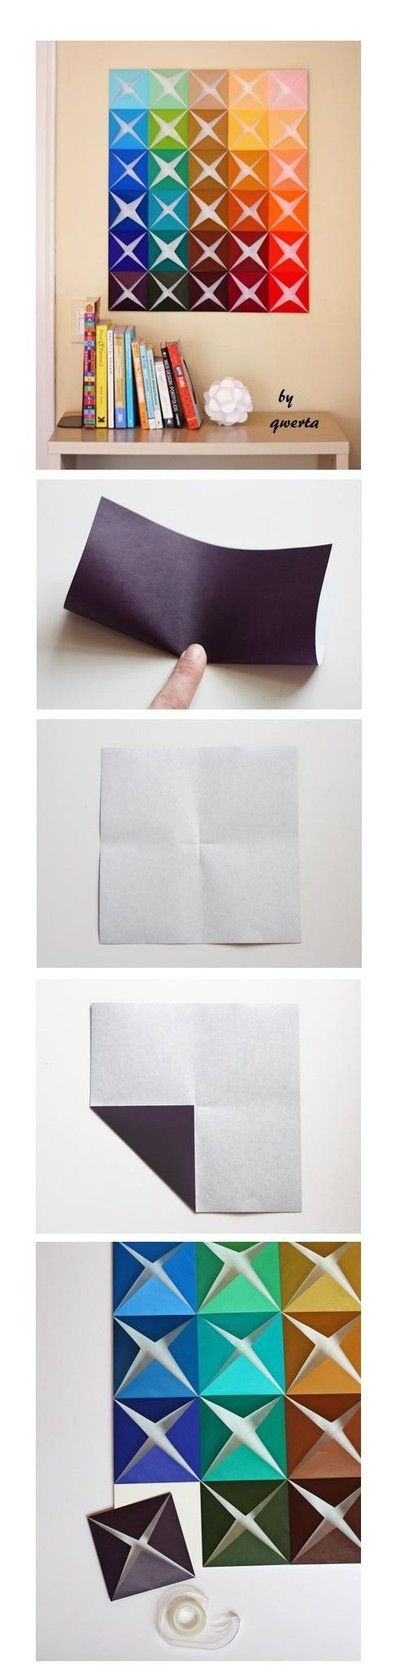 Tableau origami multicolore